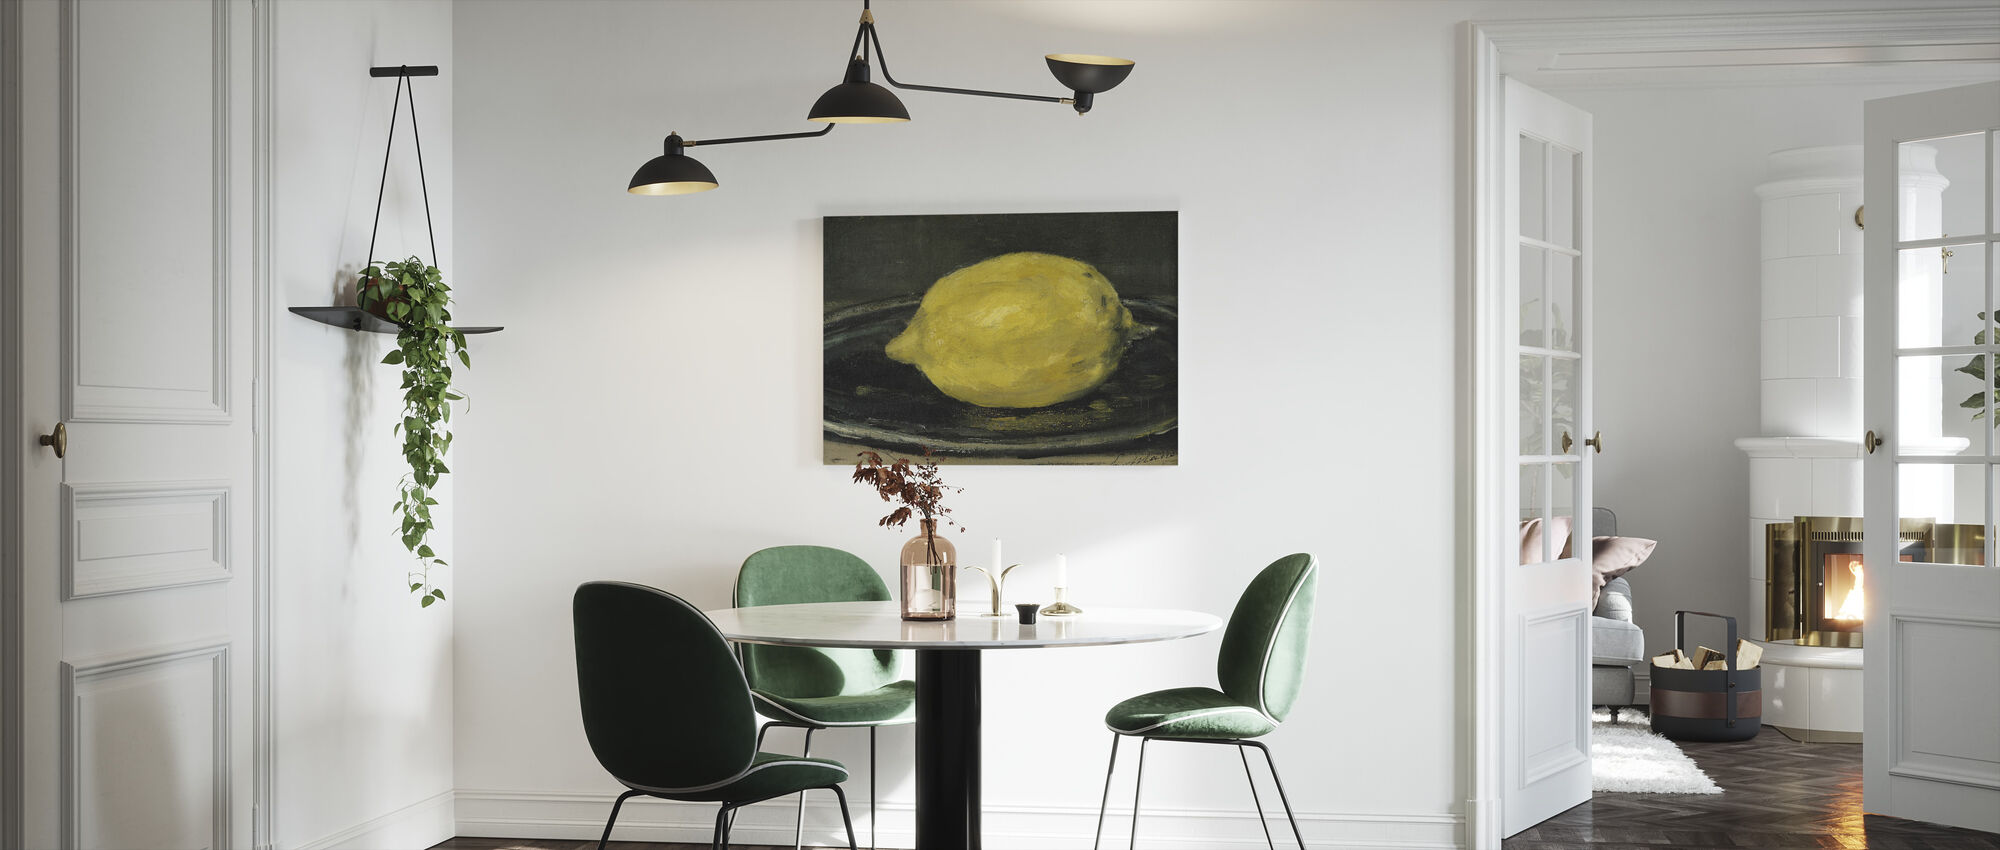 Sitruuna, Edouard Manet - Canvastaulu - Keittiö